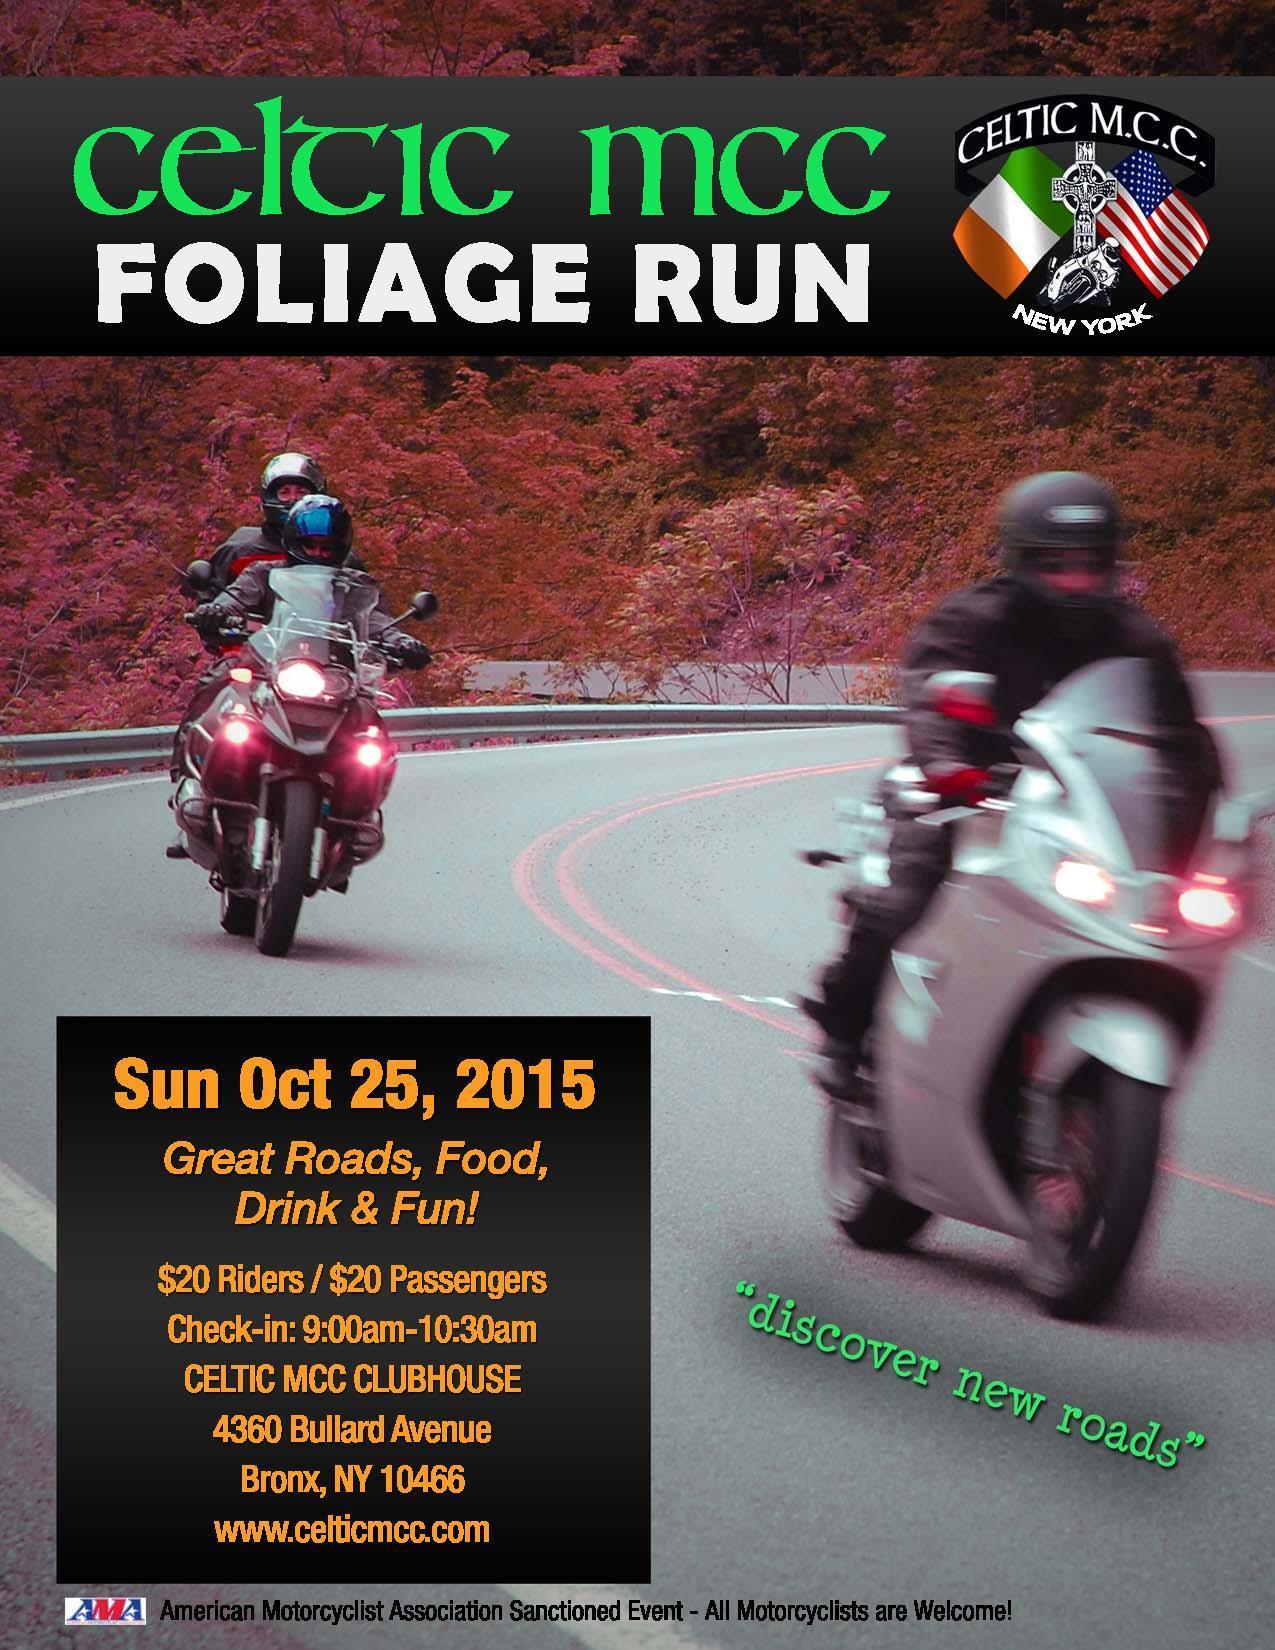 Foliage-Run-2015-printflyer-v1-Copy-page-001.jpg